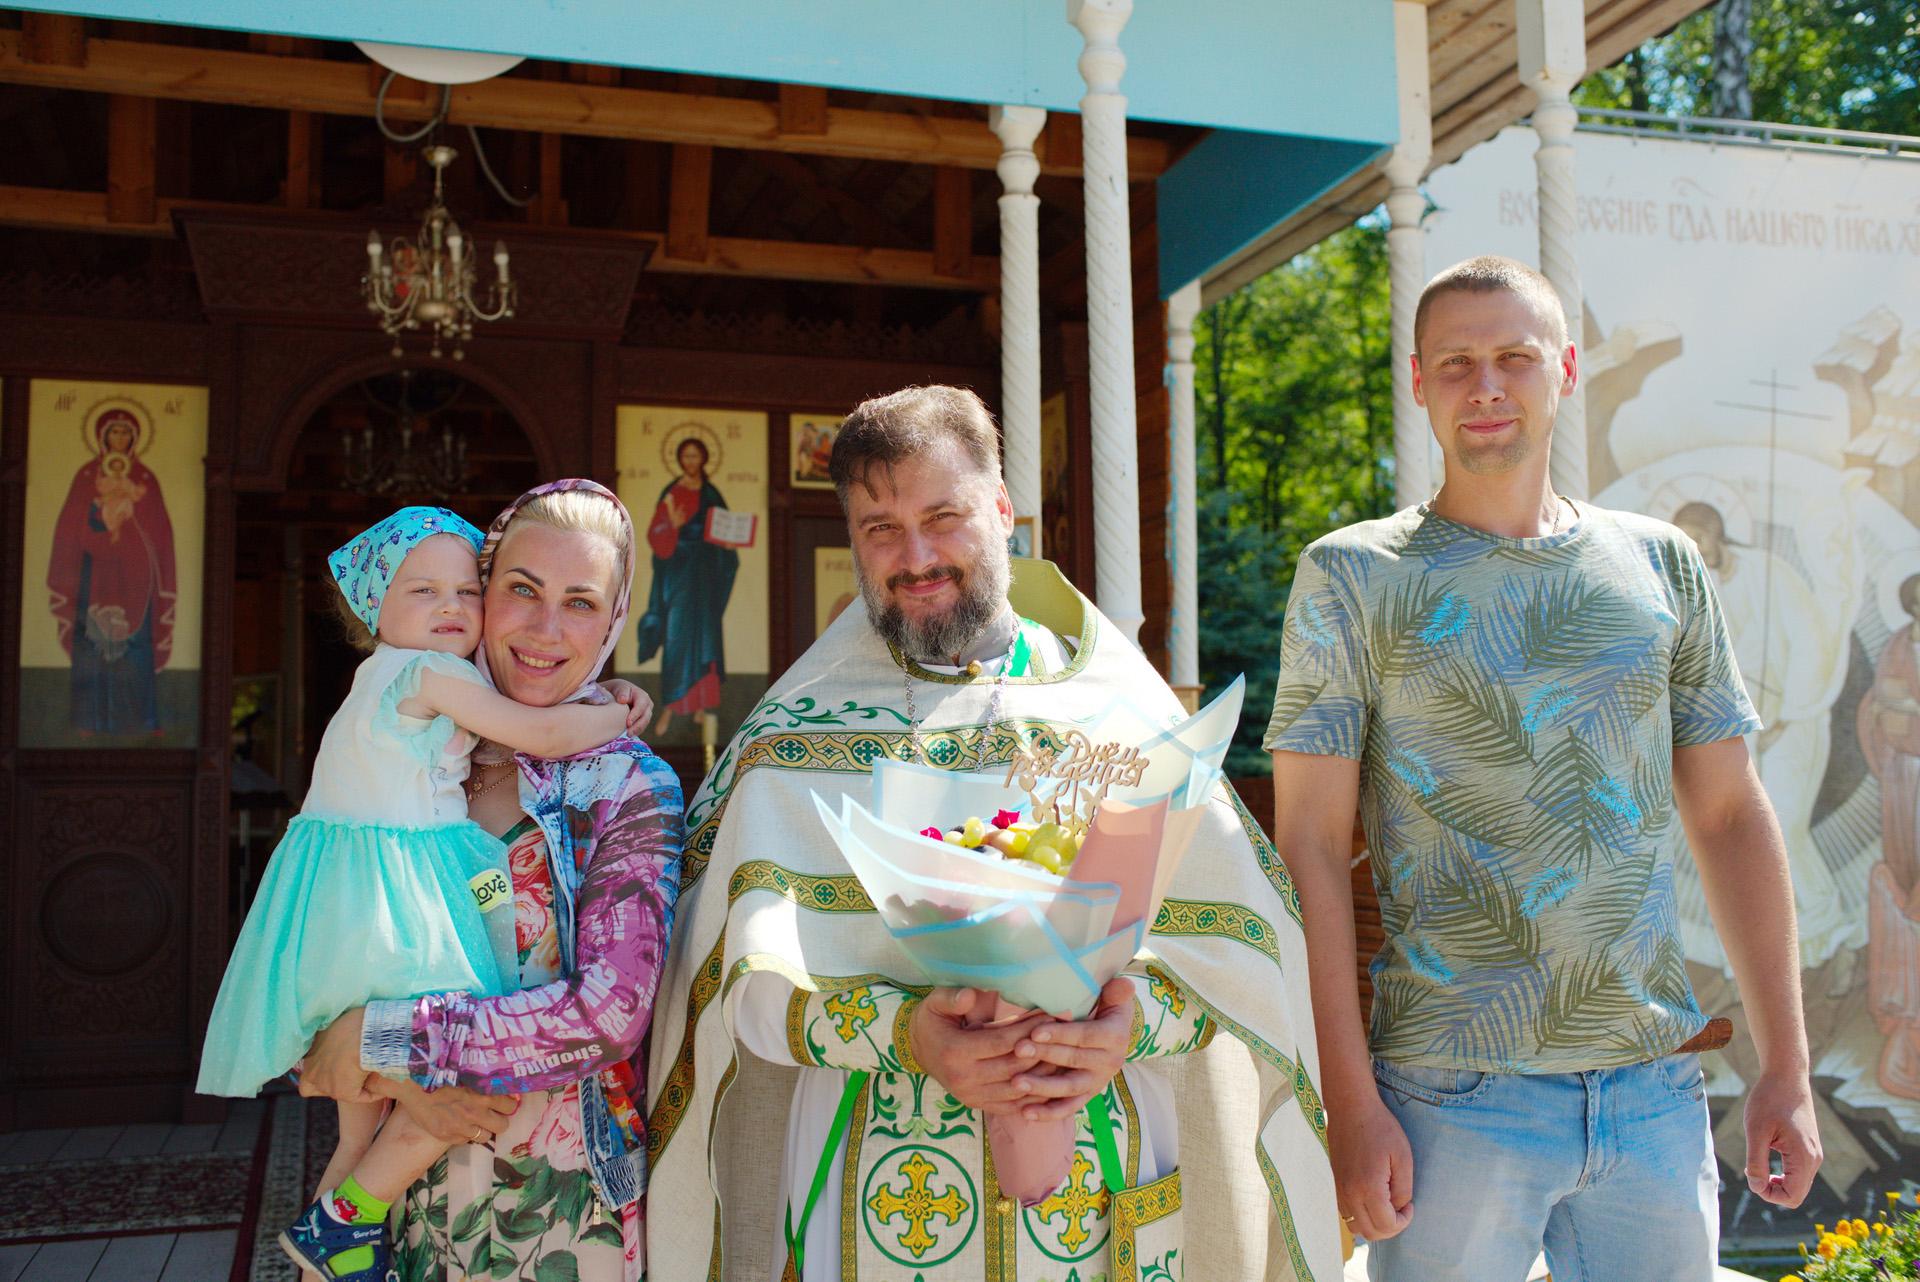 http://monuspen.ru/photoreports/63cee2eedb0b6f9799f6ffc103c27fbe.jpg